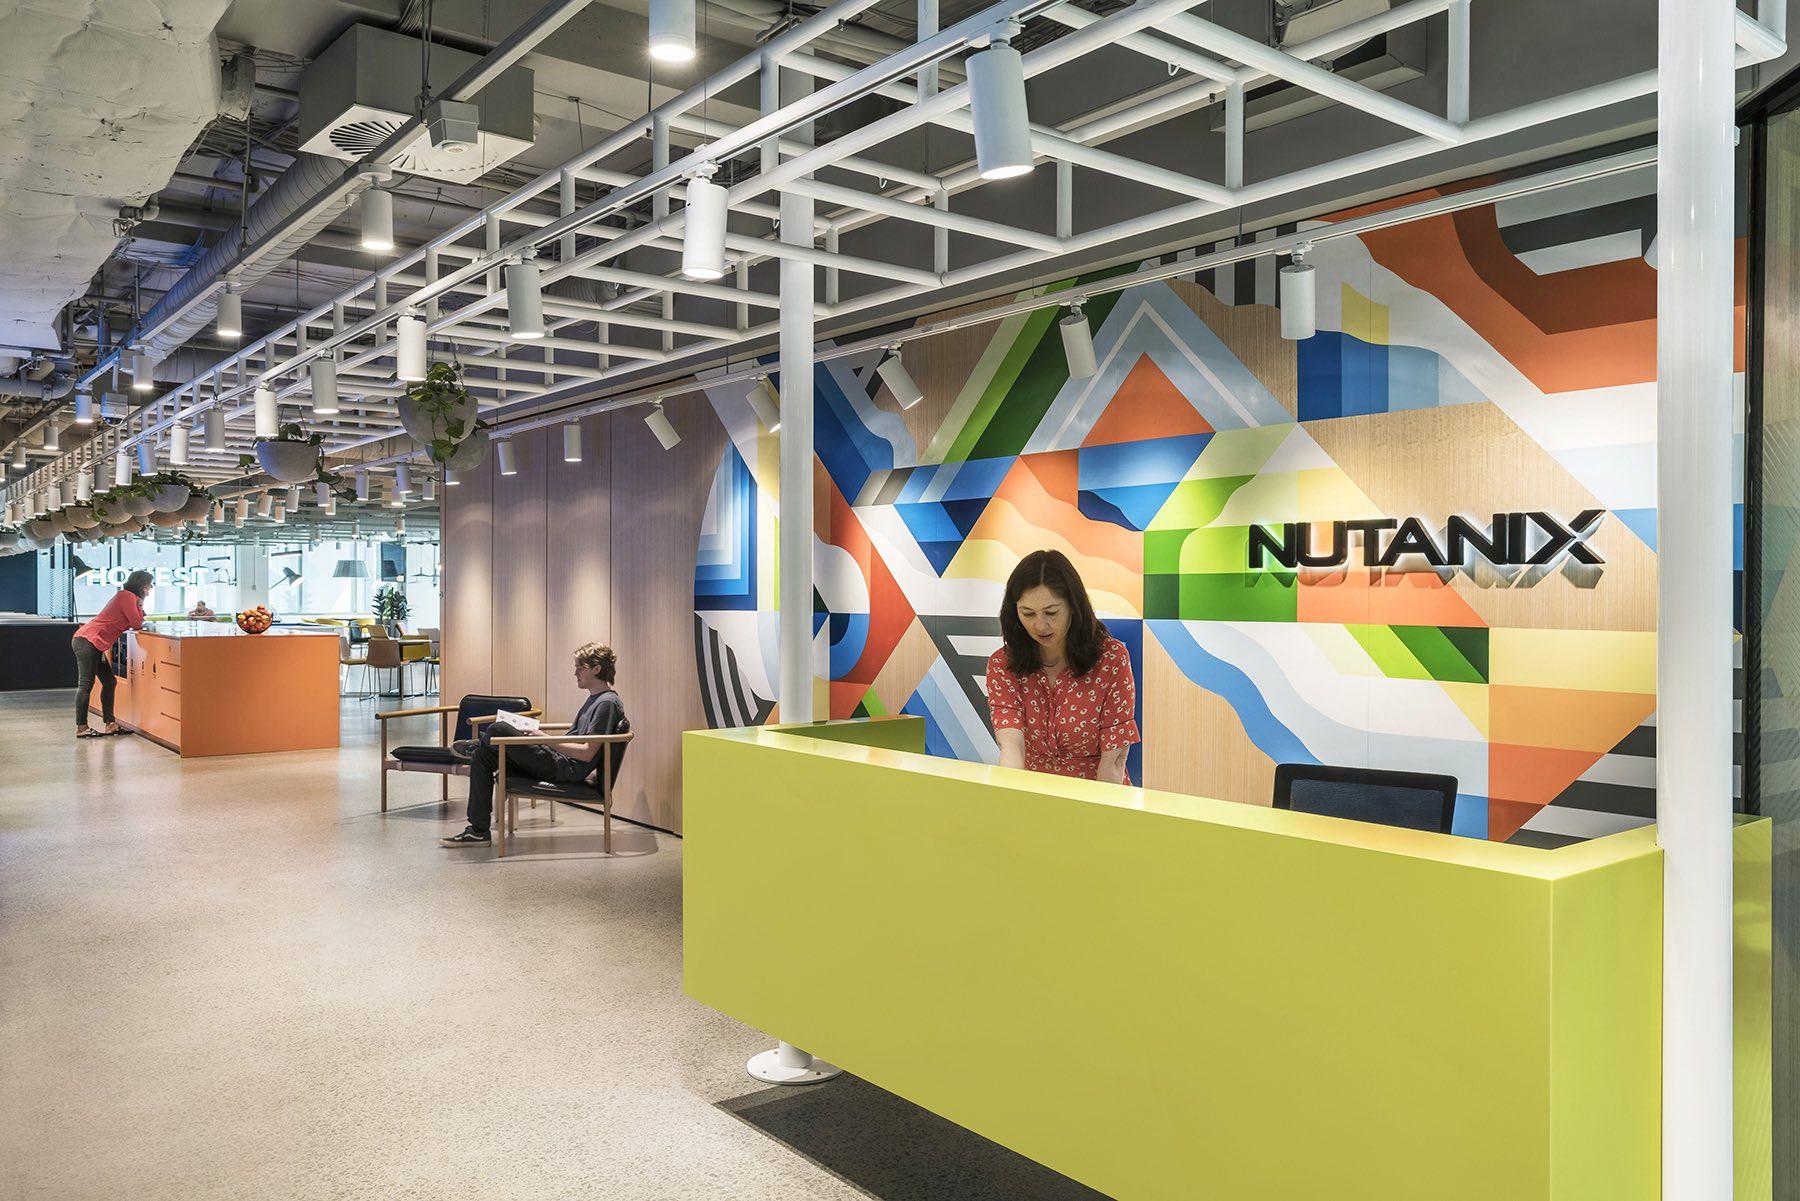 nutanix-sydney-office-7